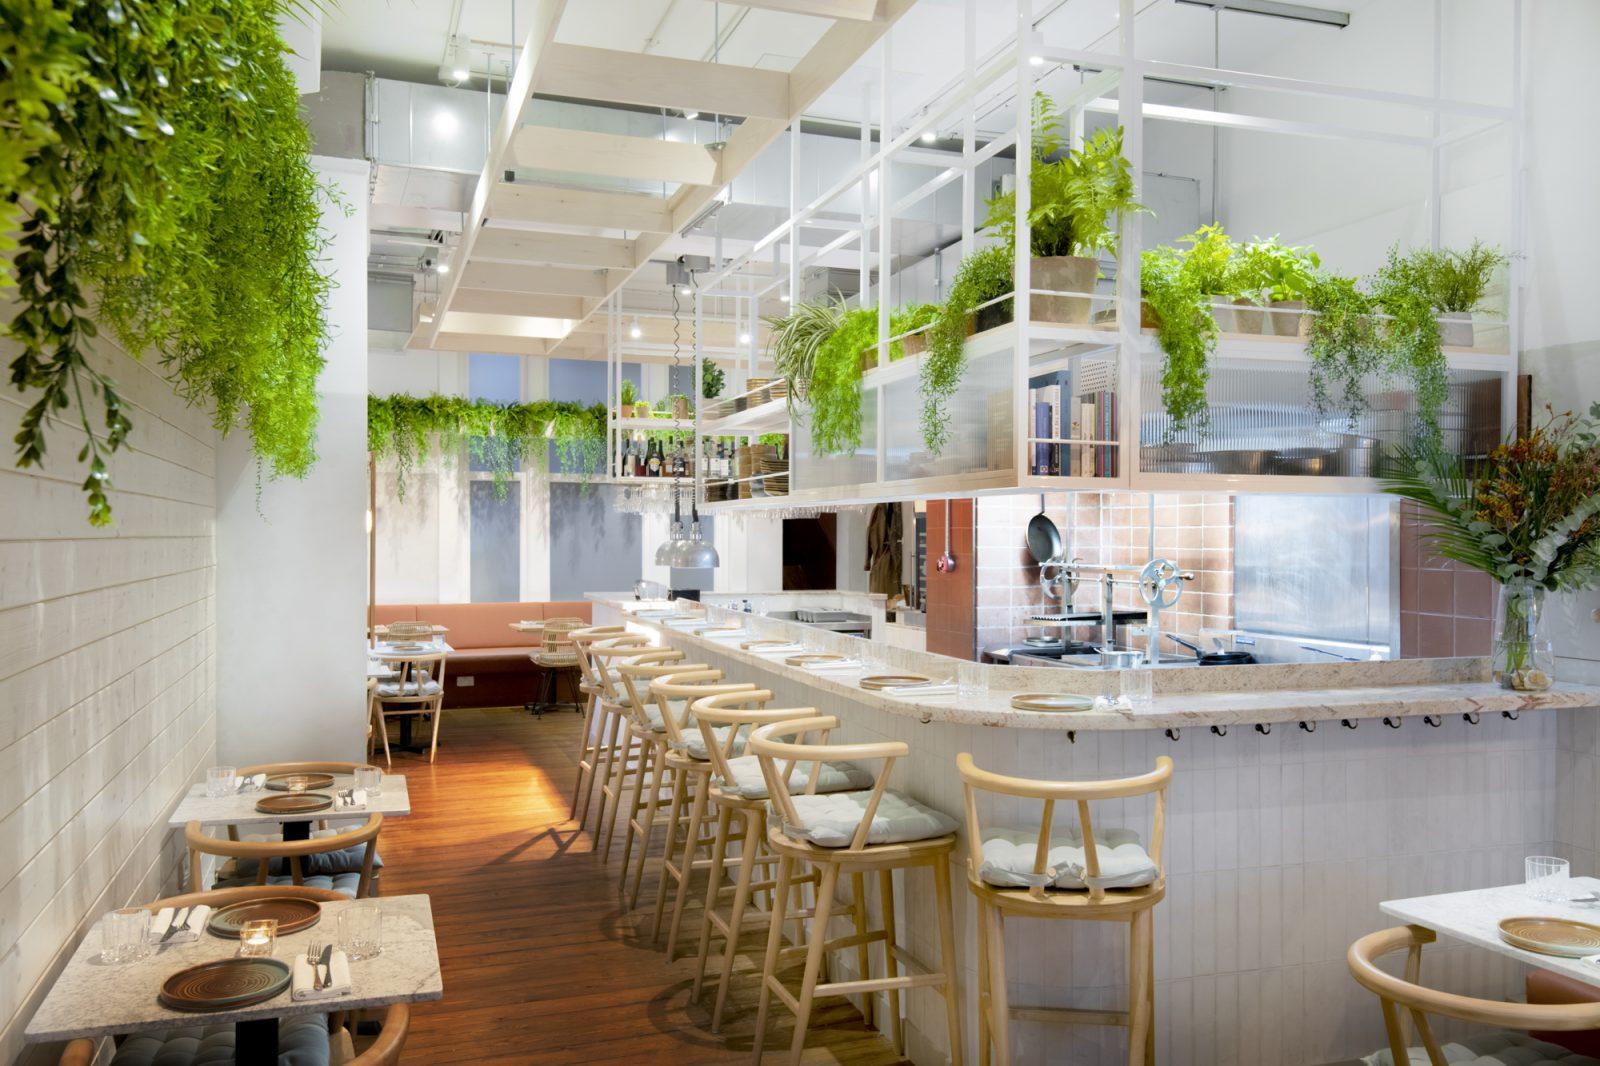 Kindling restaurant interiors